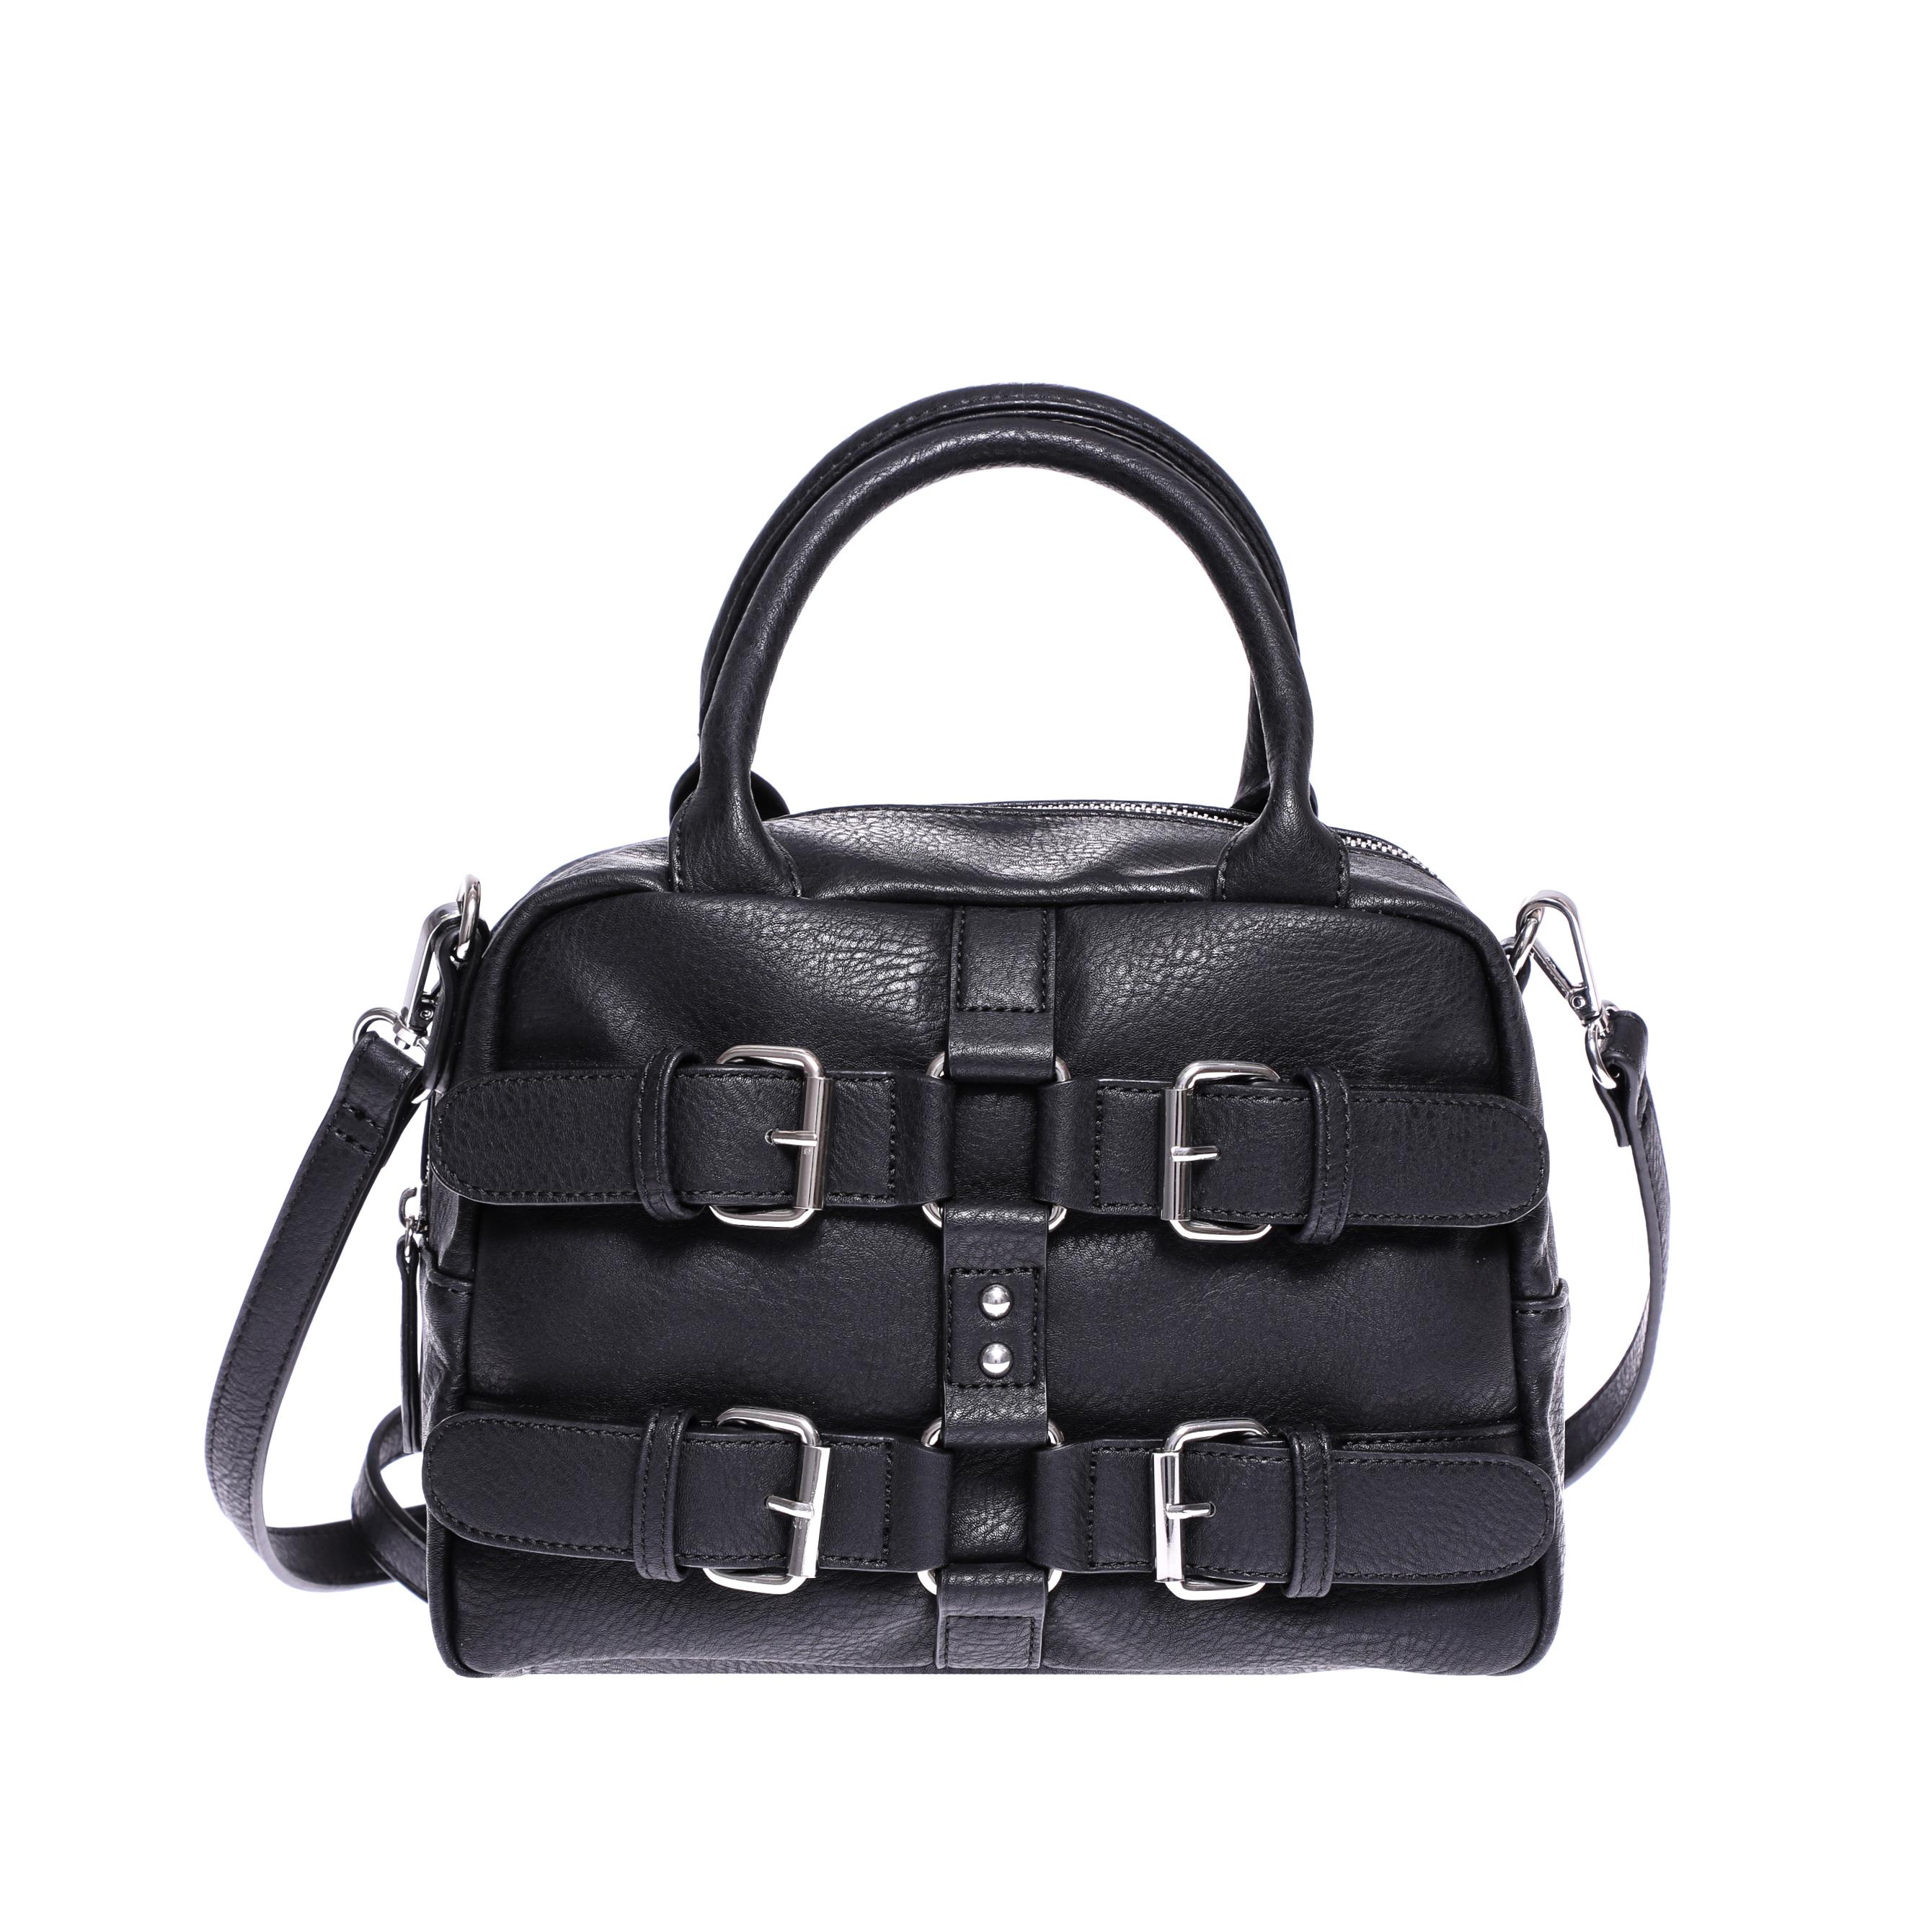 DENNY ROSE – Γυναικεία τσάντα Denny Rose μαύρη 1596977.0-0071